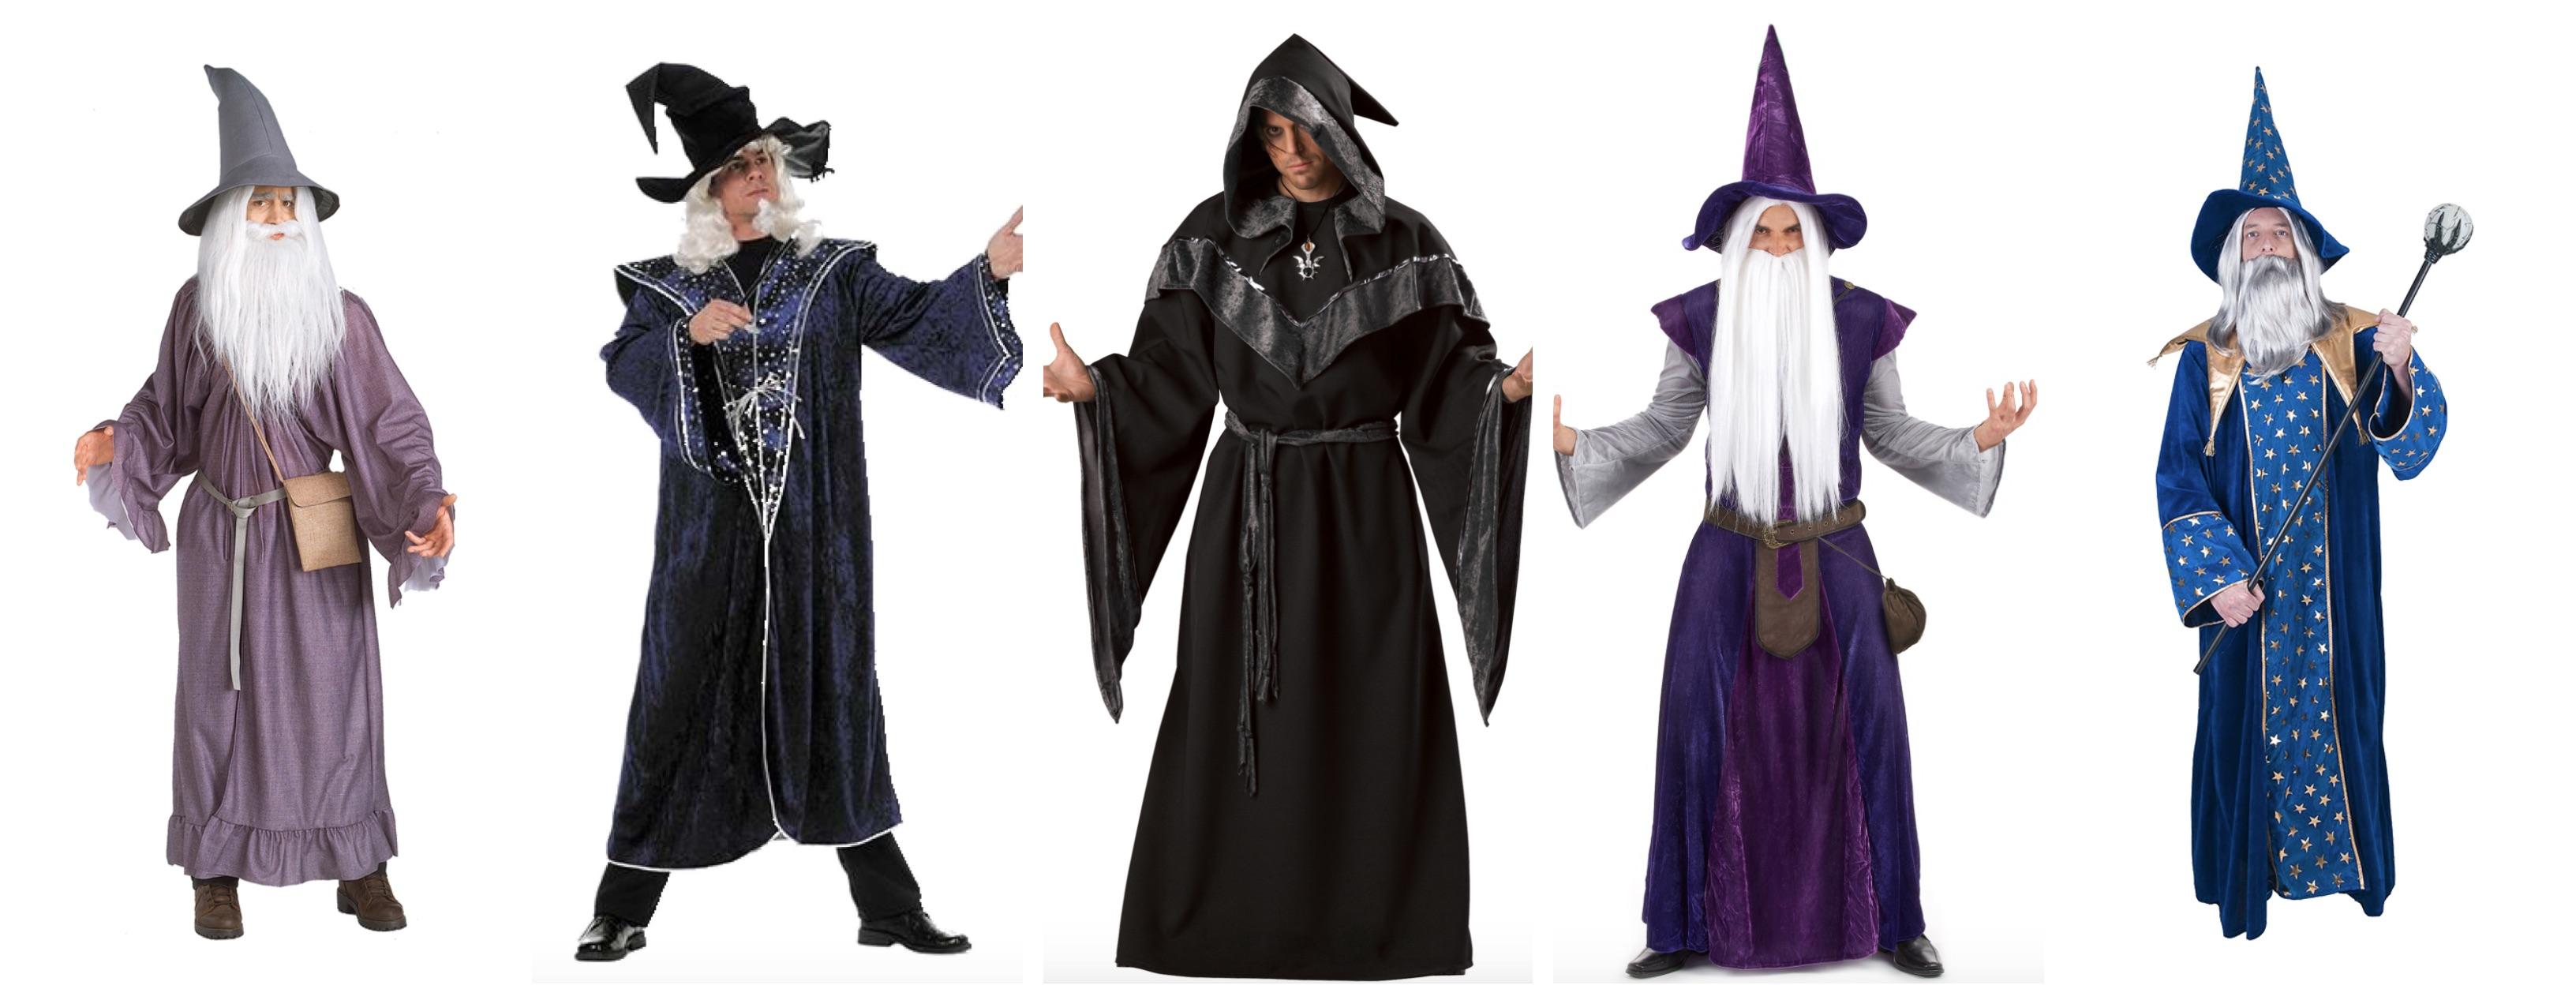 troldmand kostume til voksne - Troldmand kostume til voksne